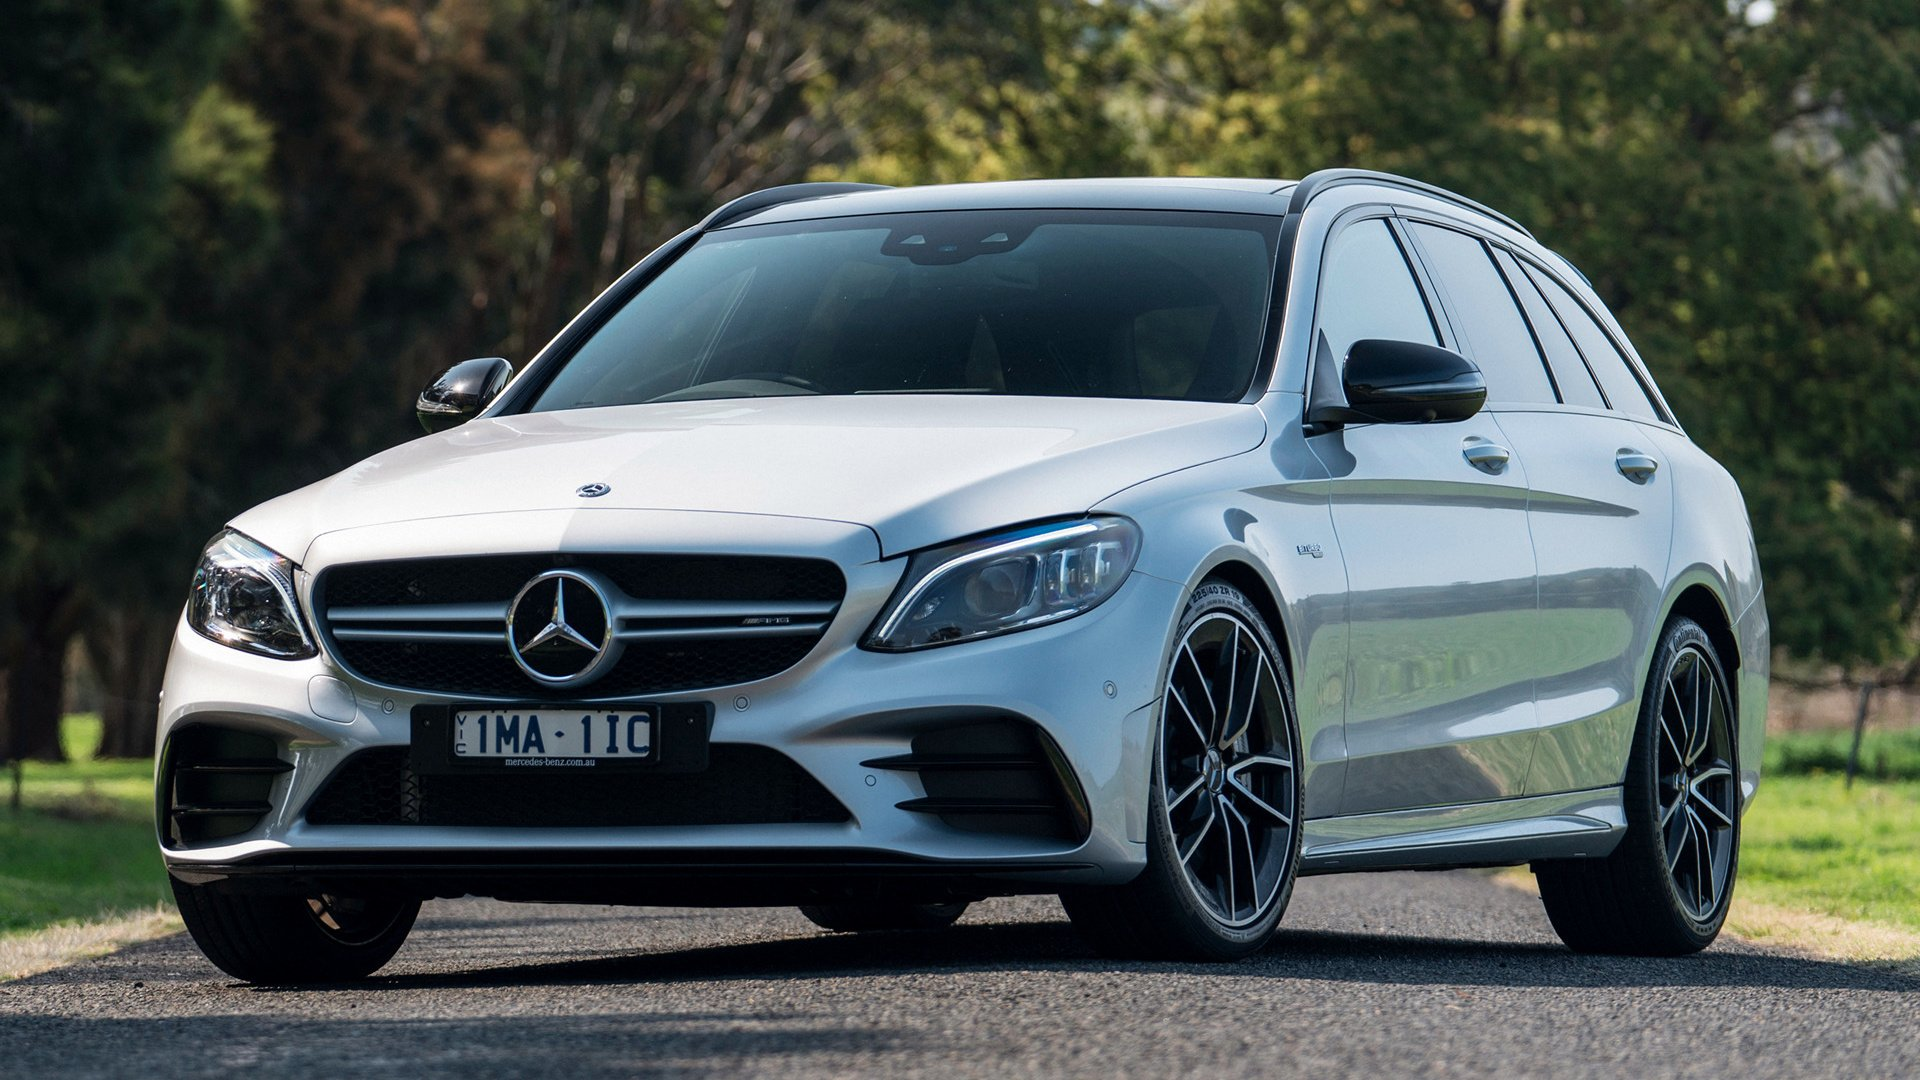 2018 Mercedes-AMG C 43 Estate HD Wallpaper | Background ...